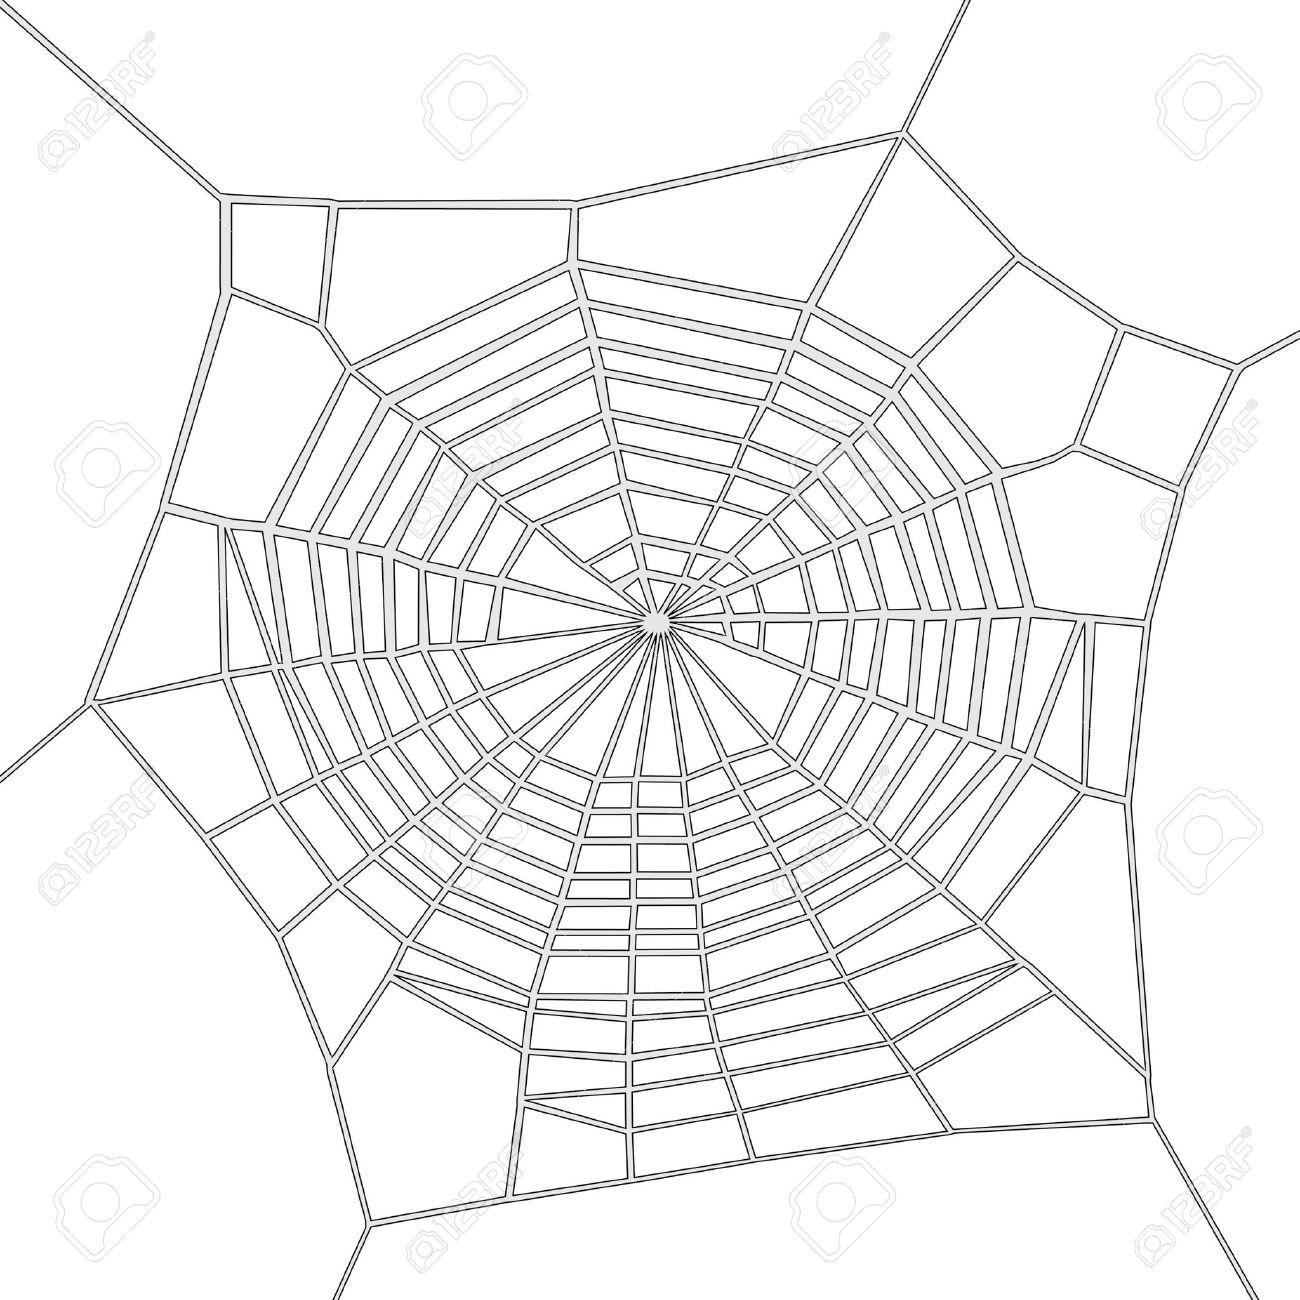 1300x1300 Spider Web Cartoon Drawing Cartoon Image Of Spider Web Stock Photo